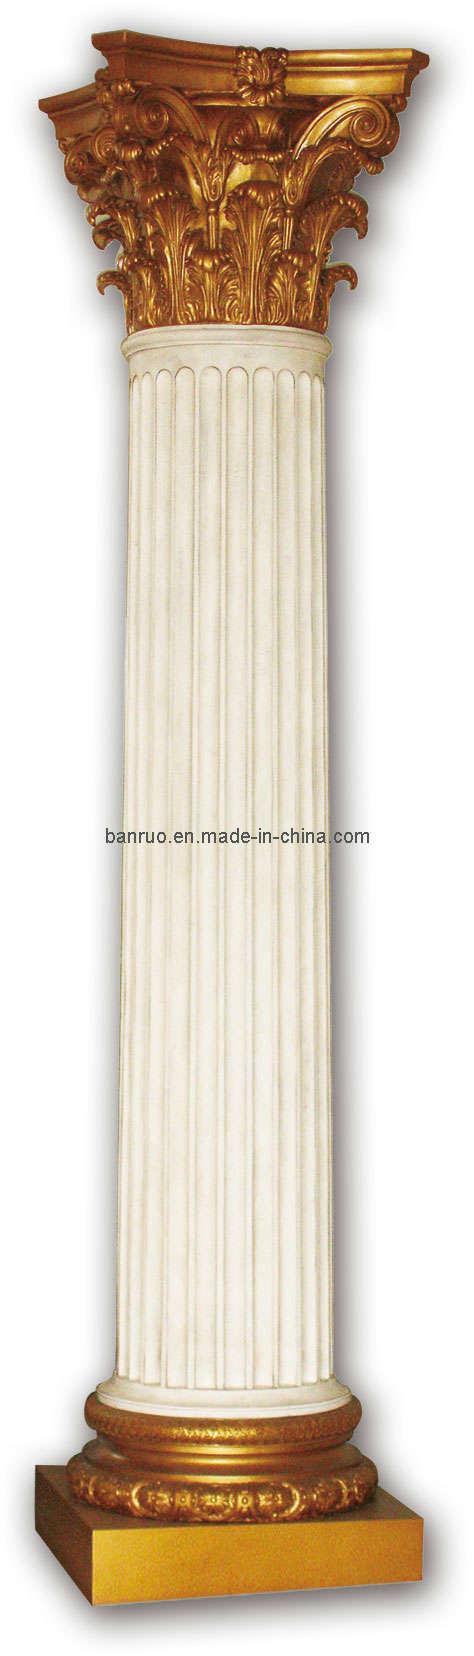 Banruo Roman Pillar -3 for Home Decoration